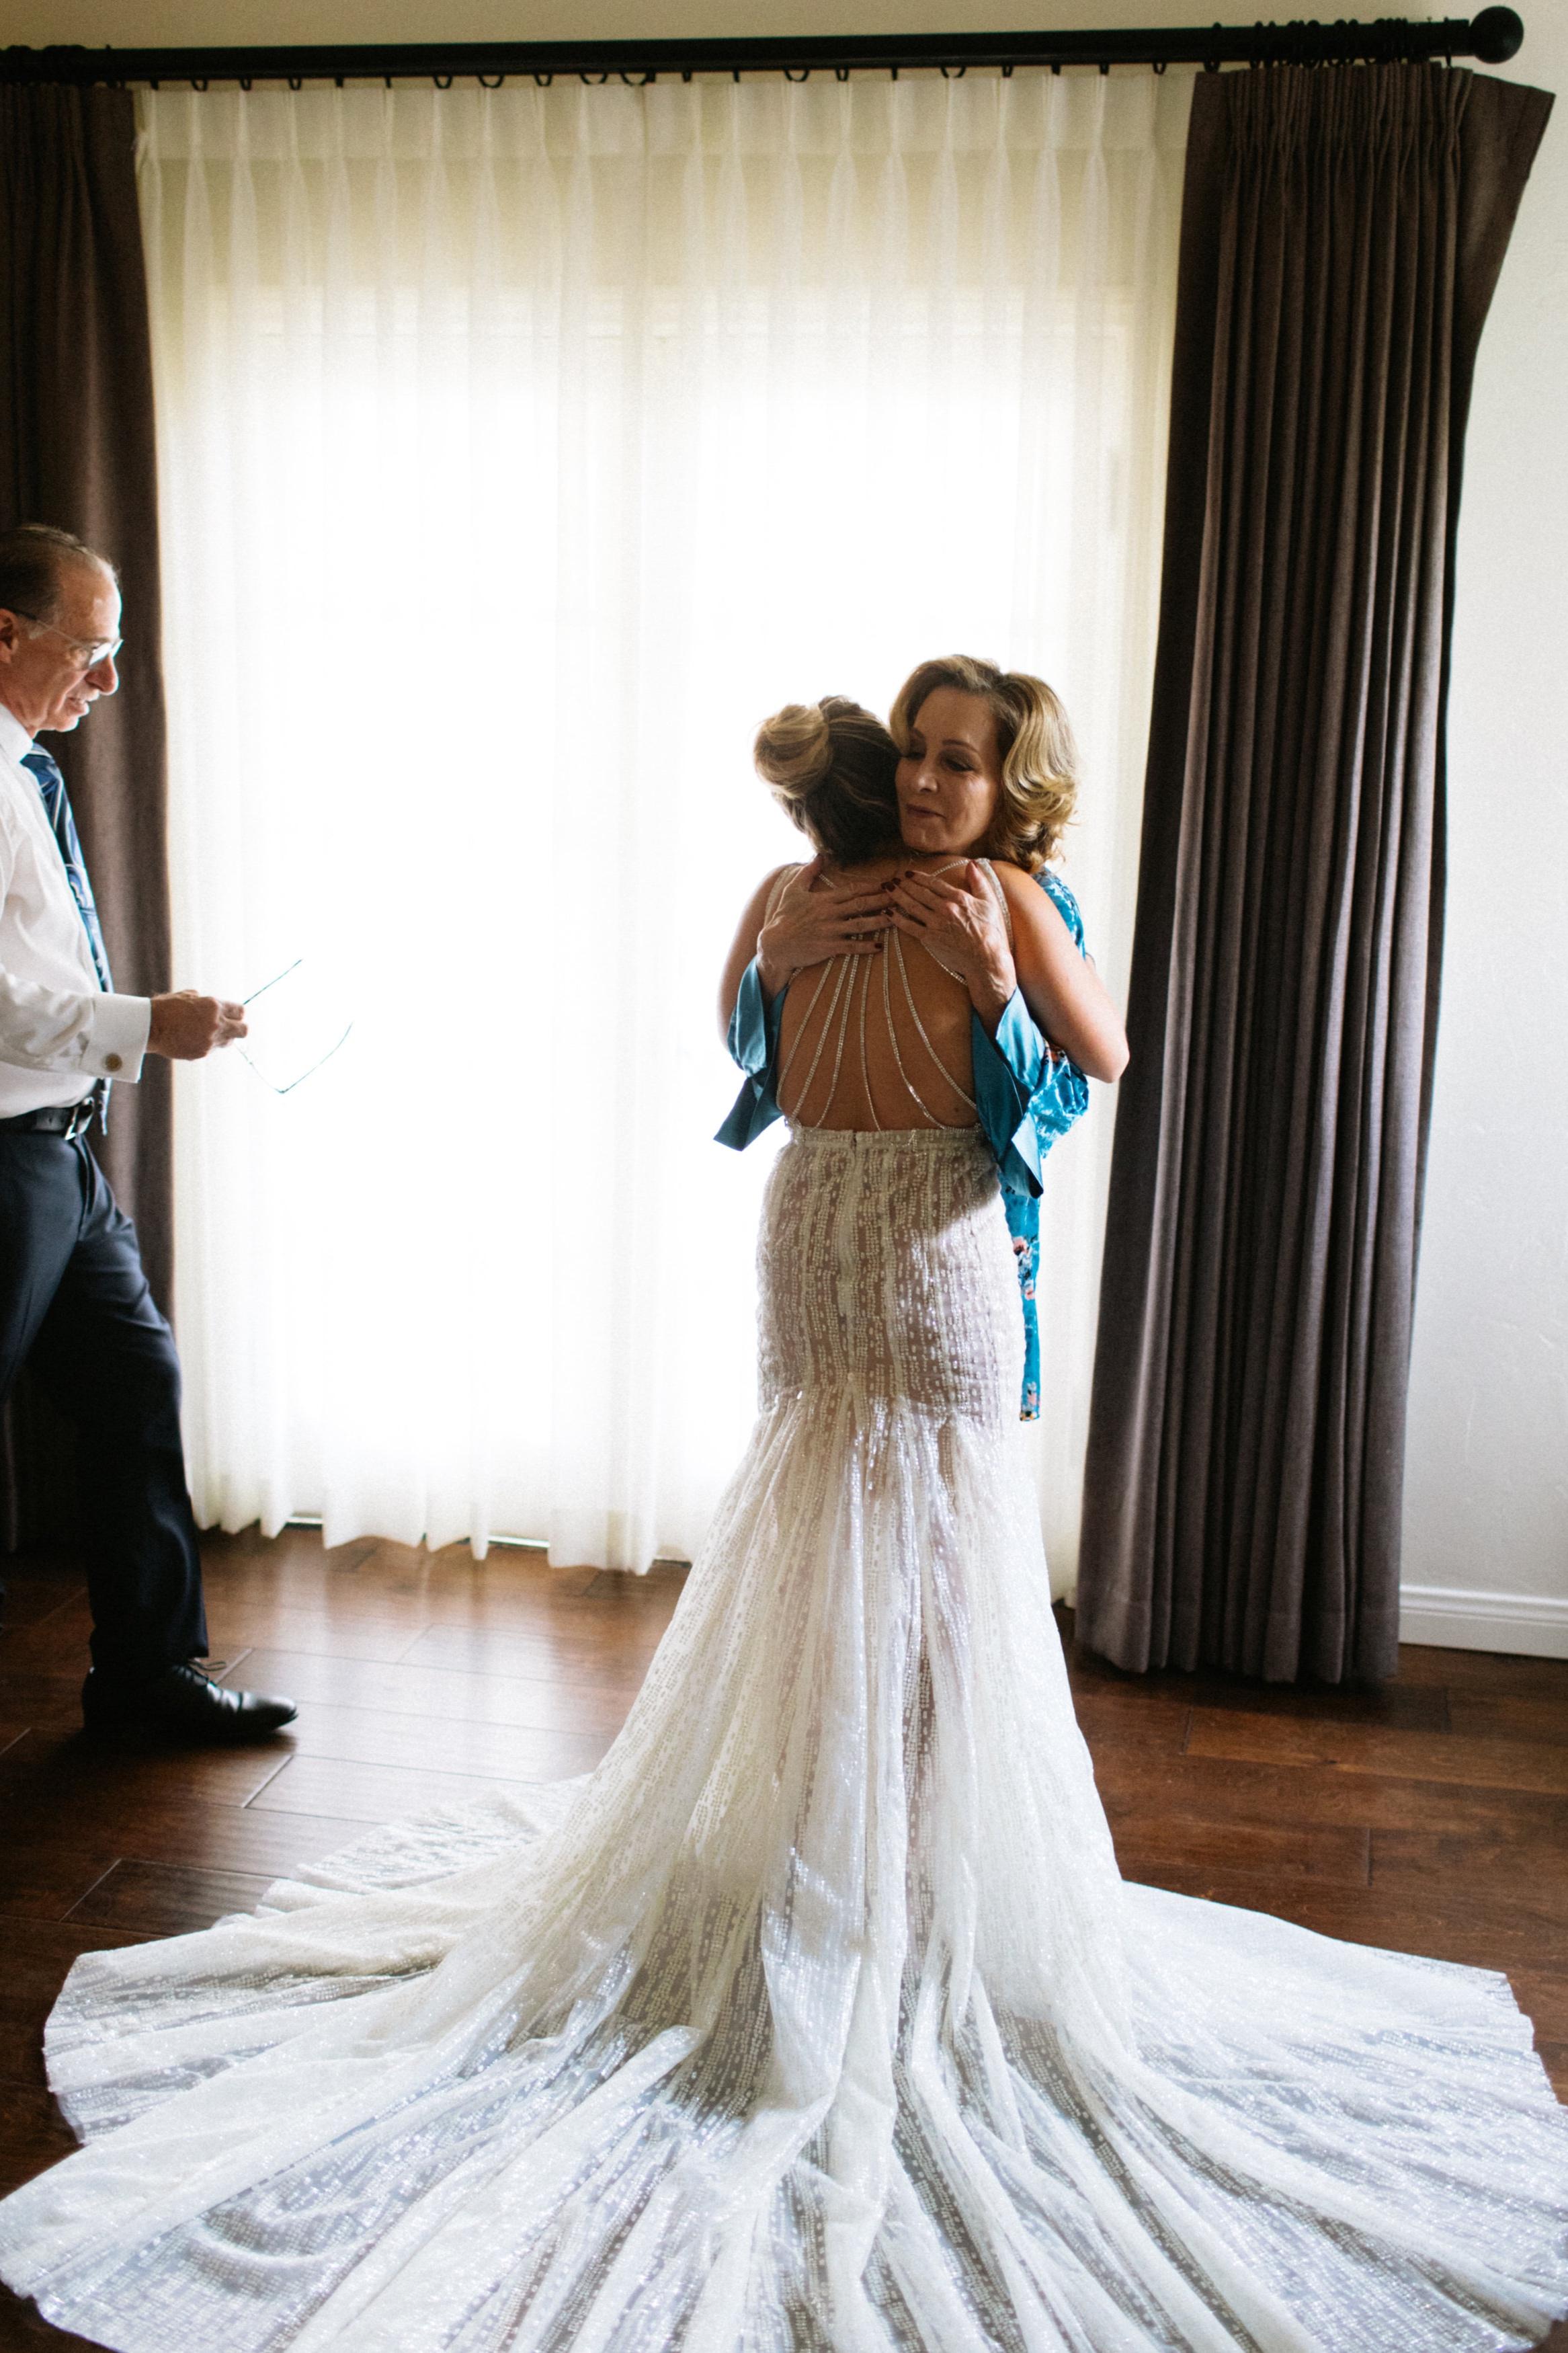 Dara_%26amp%3B_Garrett_Colony_Palms_Hotel_Wedding_Photos-108.jpg